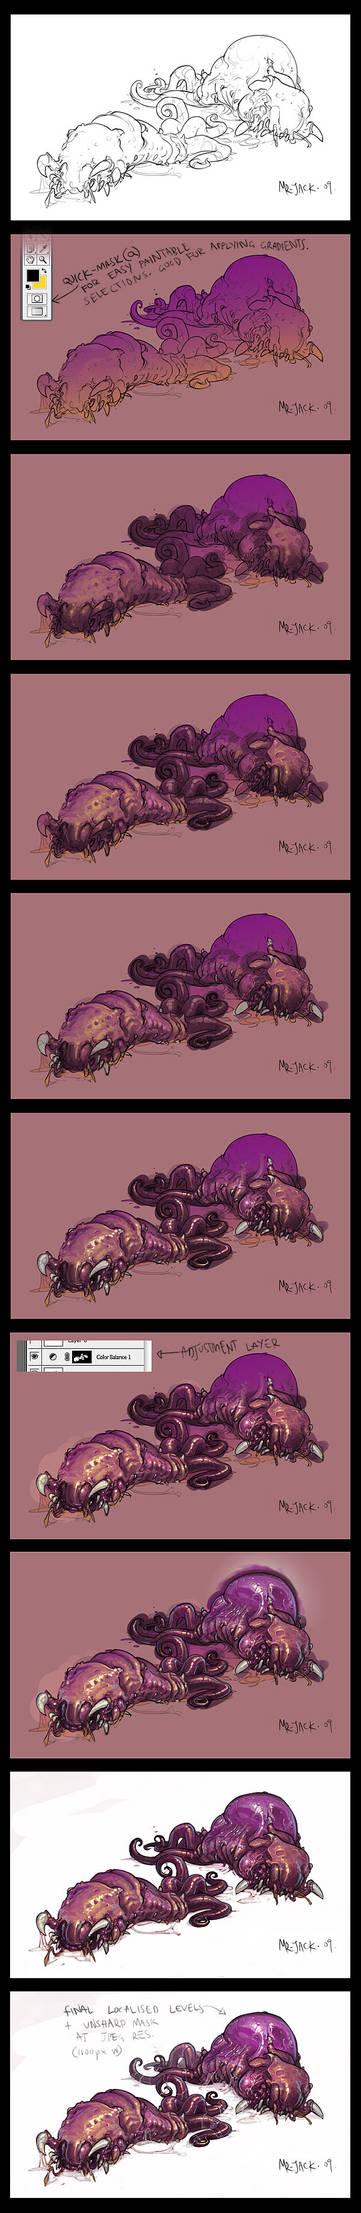 Larvae progress